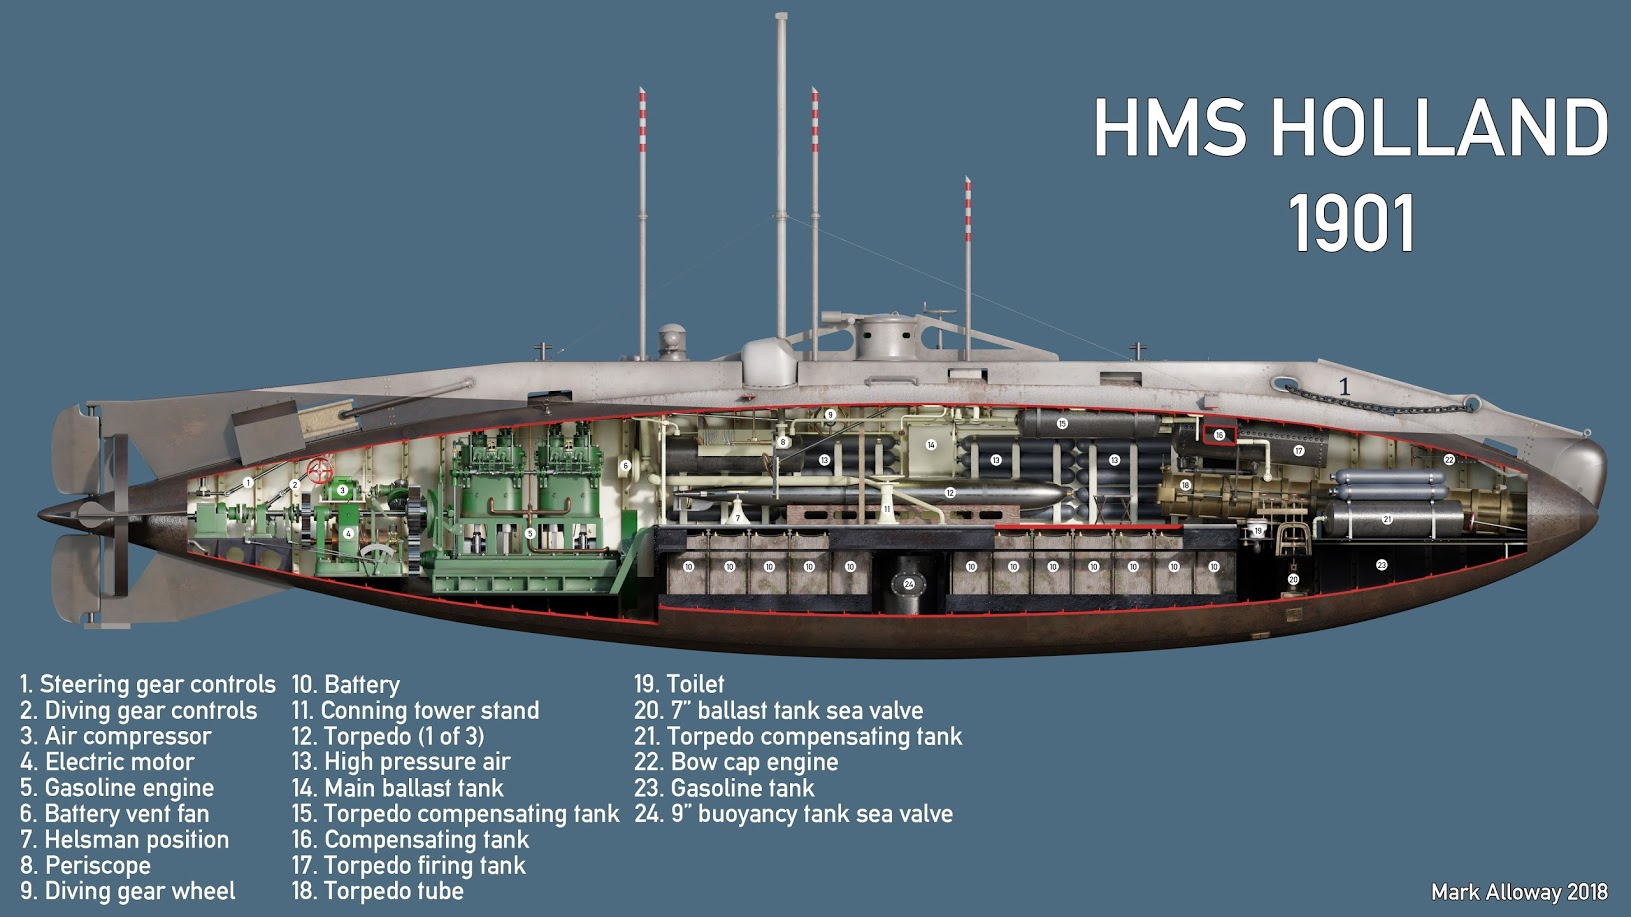 HMS HOLLAND CUTAWAY INTERIOR